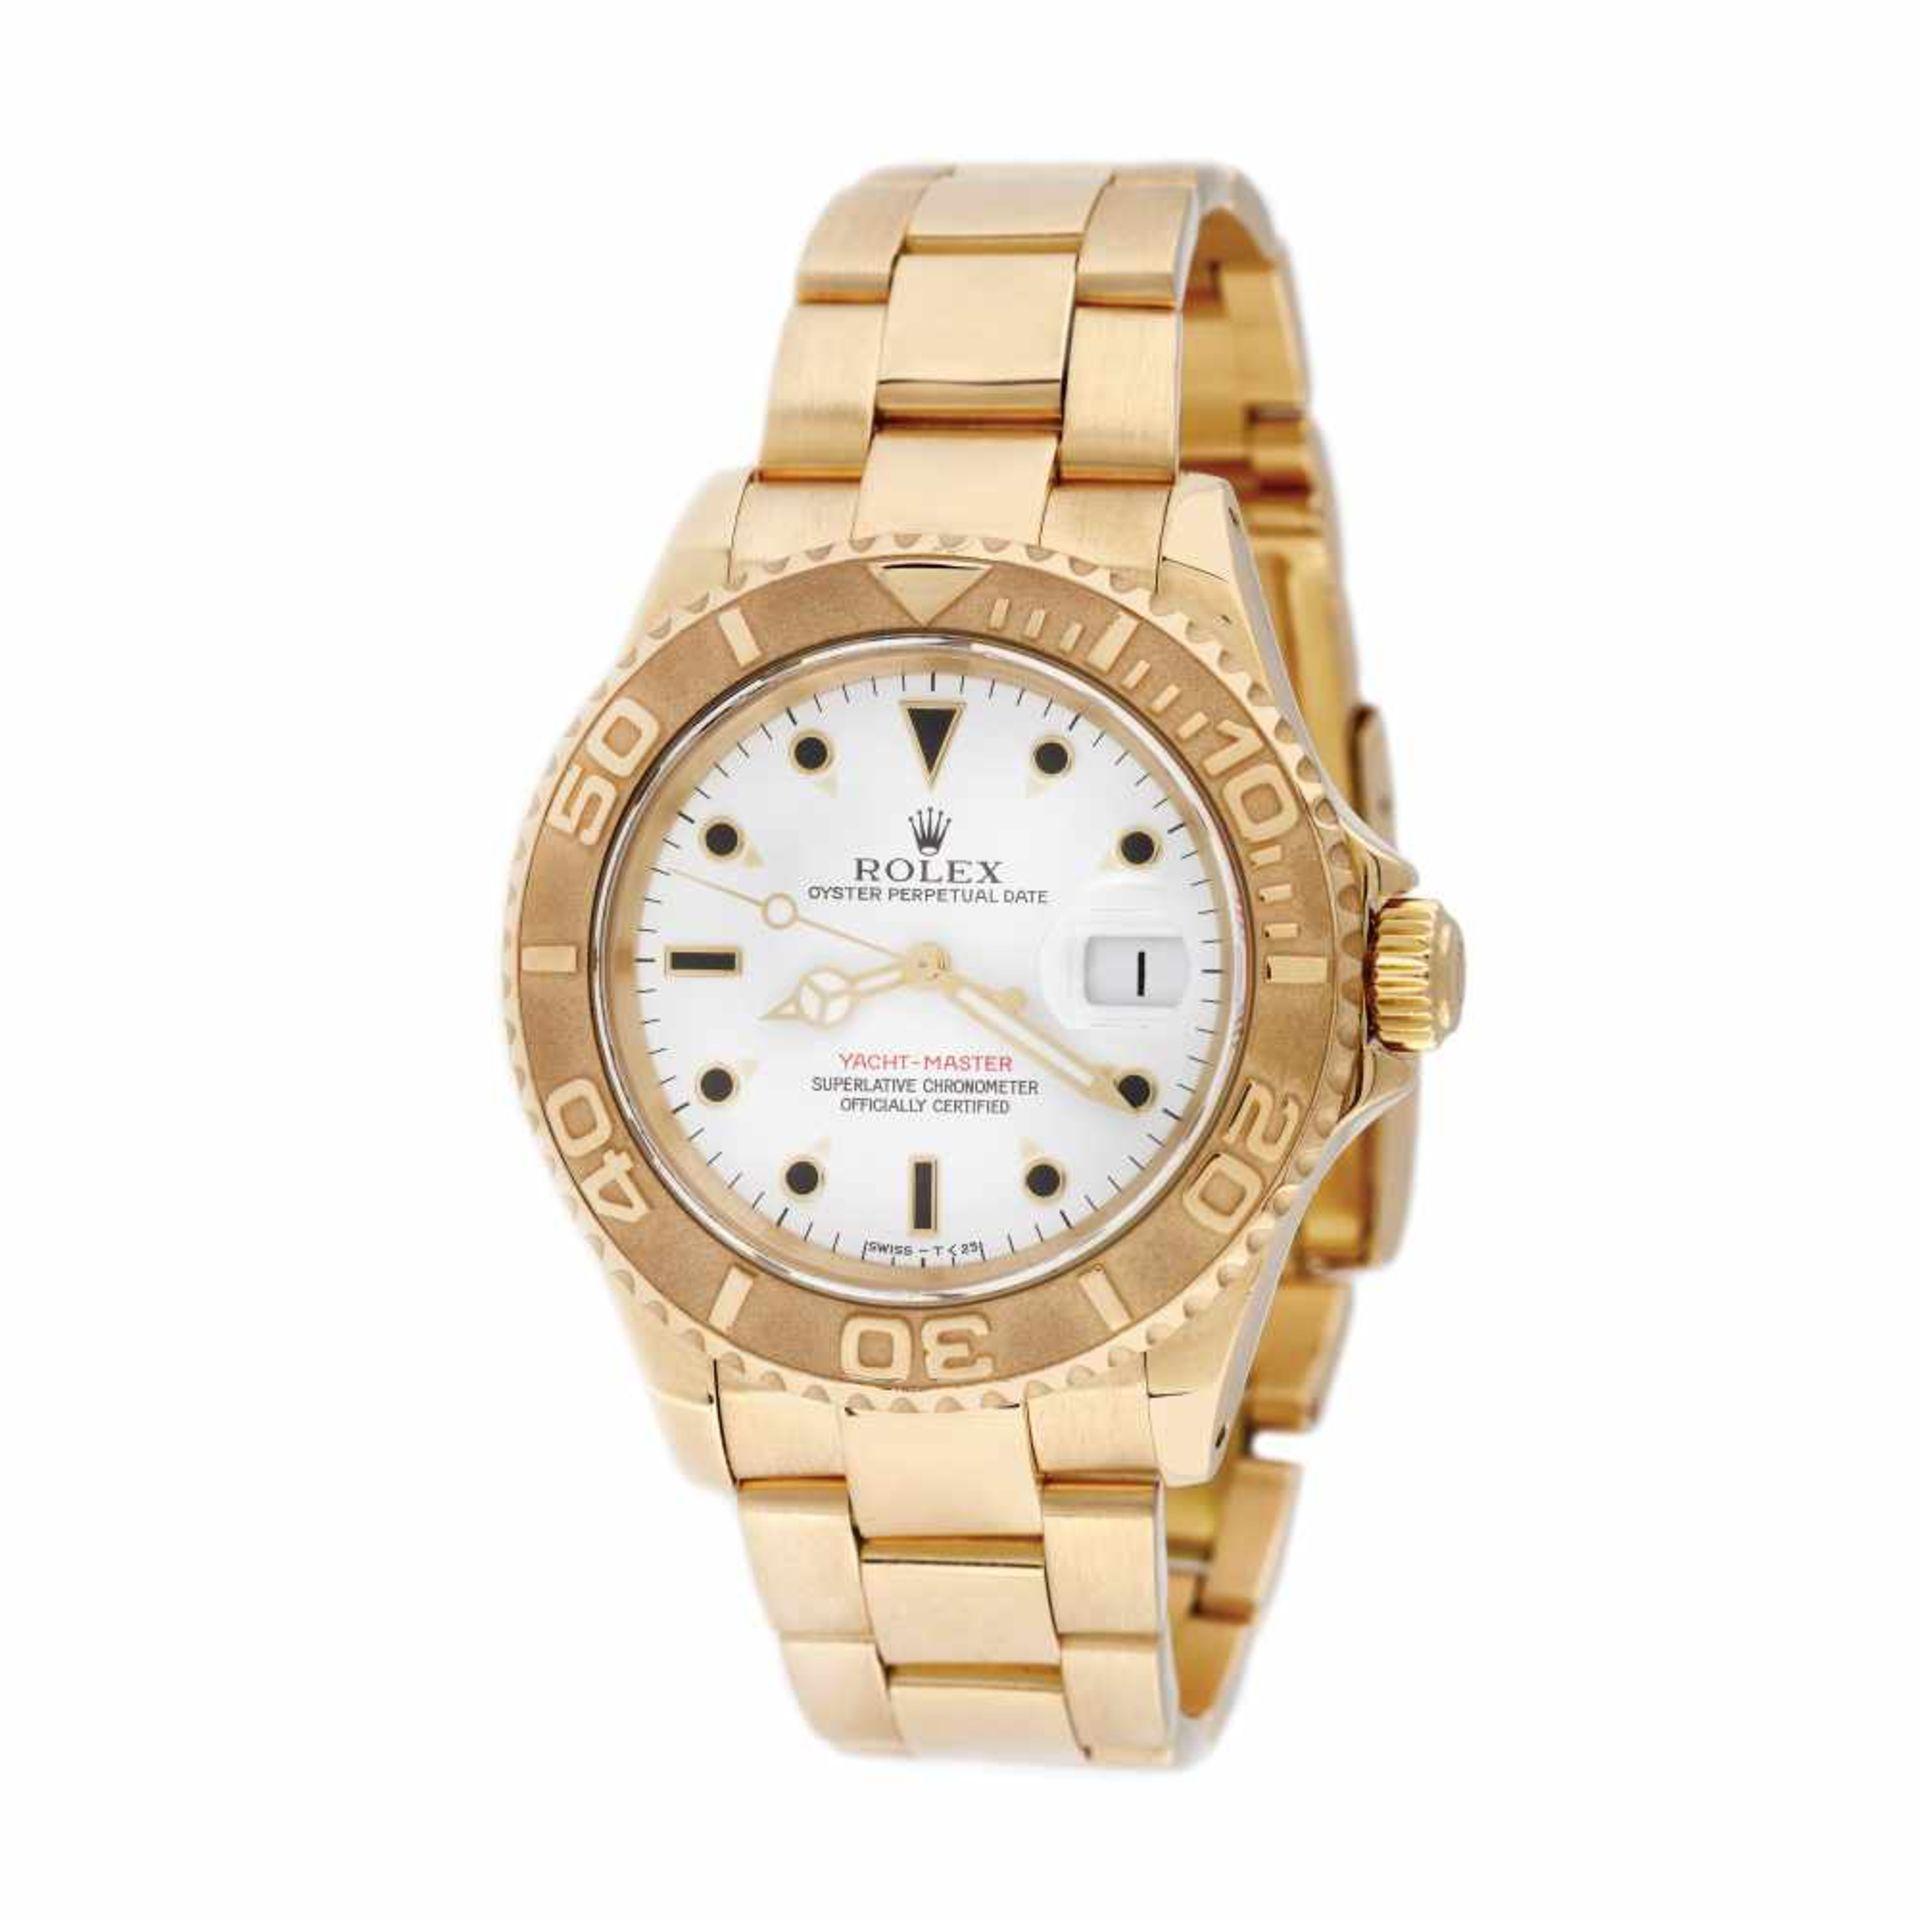 Rolex Yacht Master wristwatch, gold, men, instruction manual and original box